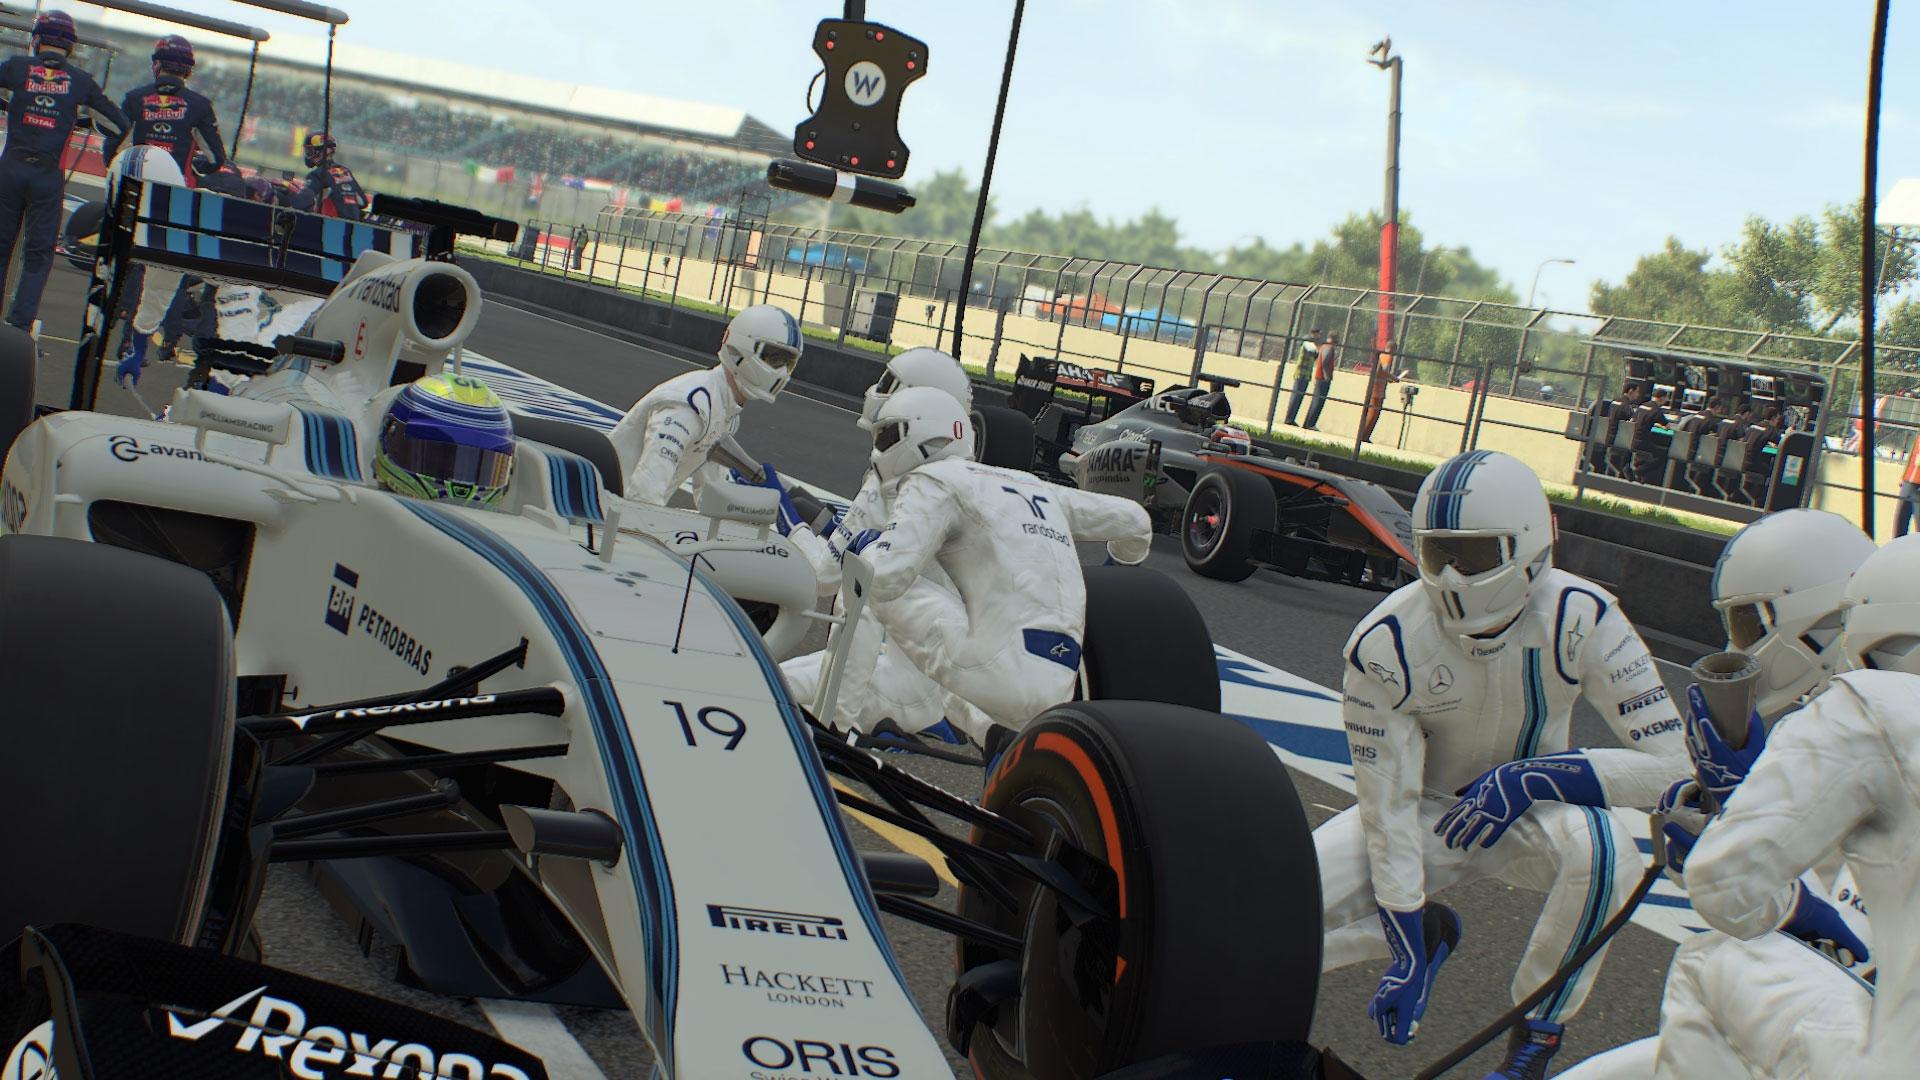 F1_2015_Silverstone_007.jpg